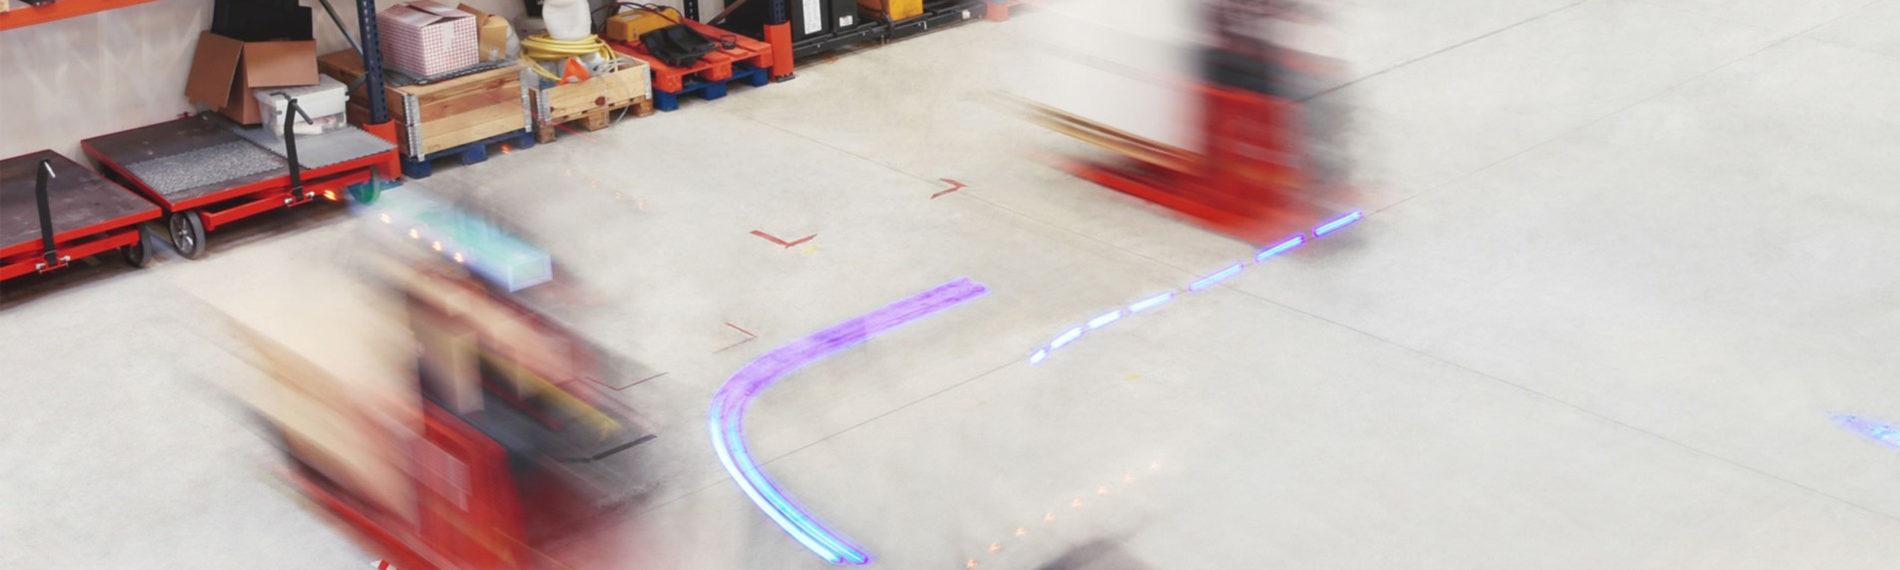 fahrerlose-transportsysteme linde robotics automatisierung